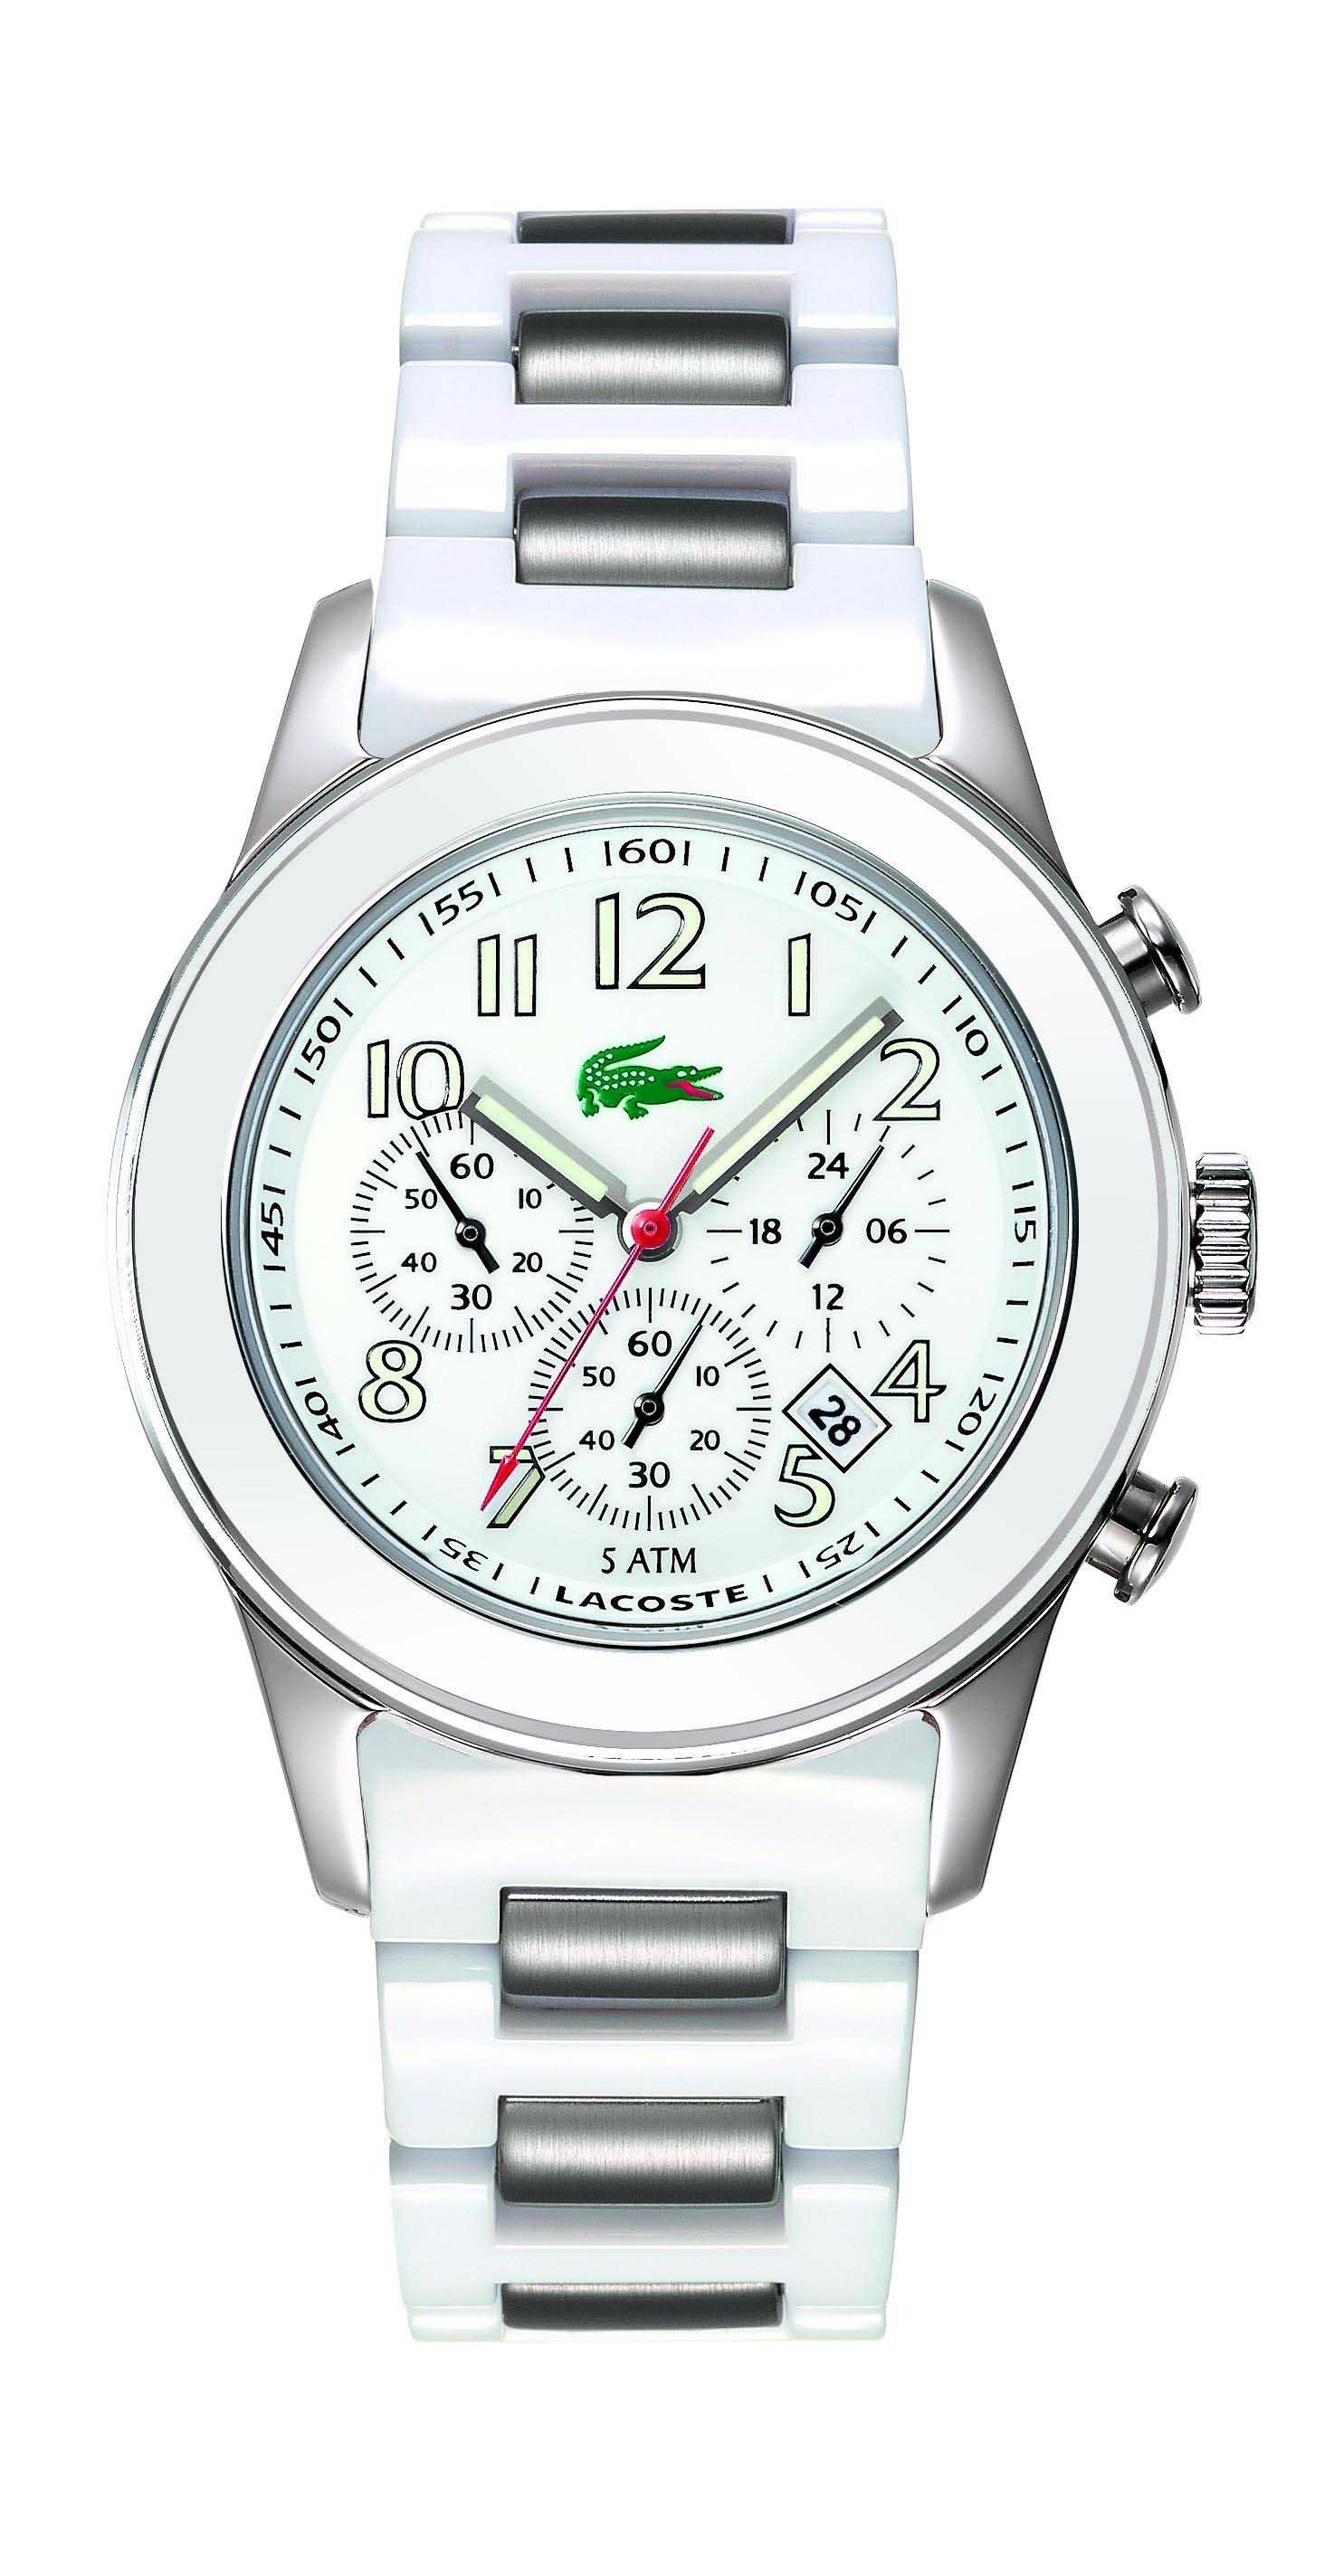 e85aa81e475 Relógio Lacoste Feminino Policarbonato Branco - 2000381